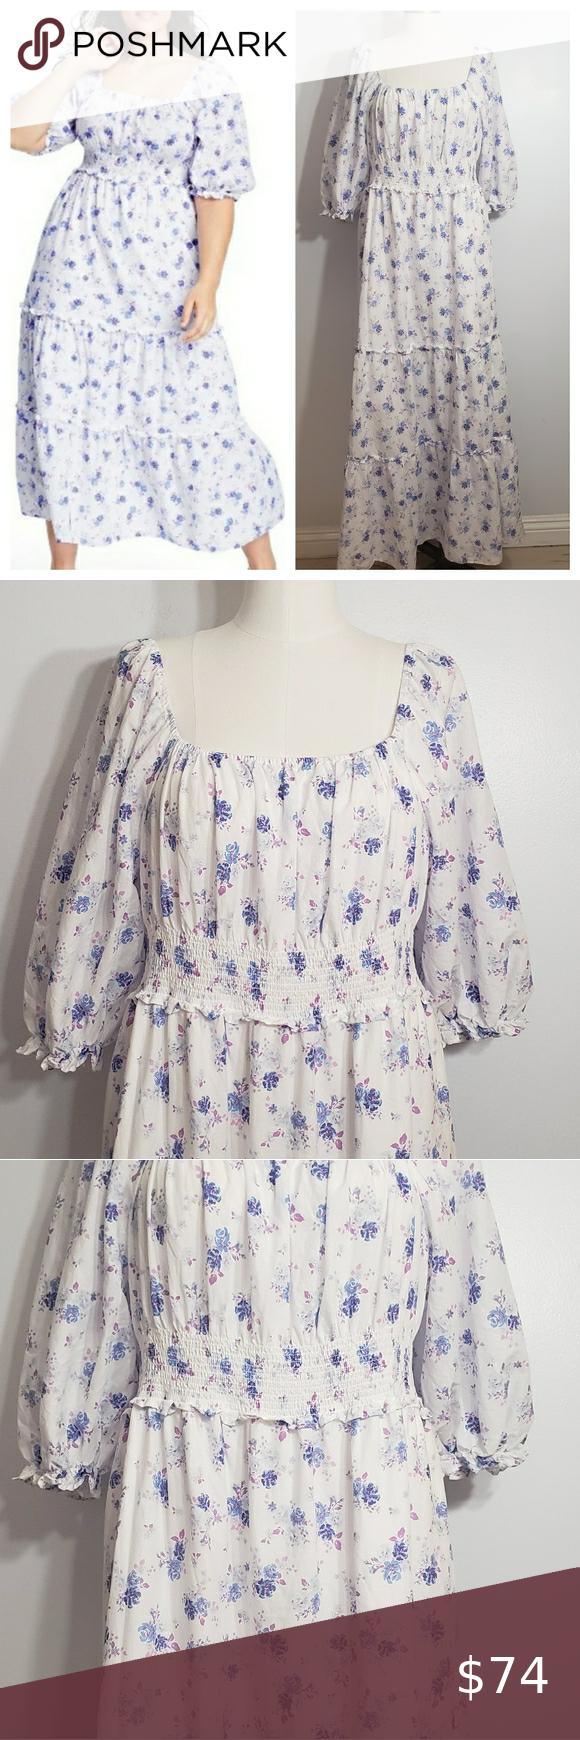 Loveshackfancy X Target Gemma Floral Maxi Dress Xl Floral Maxi Dress Blue Floral Maxi Dress Maxi Dress [ 1740 x 580 Pixel ]